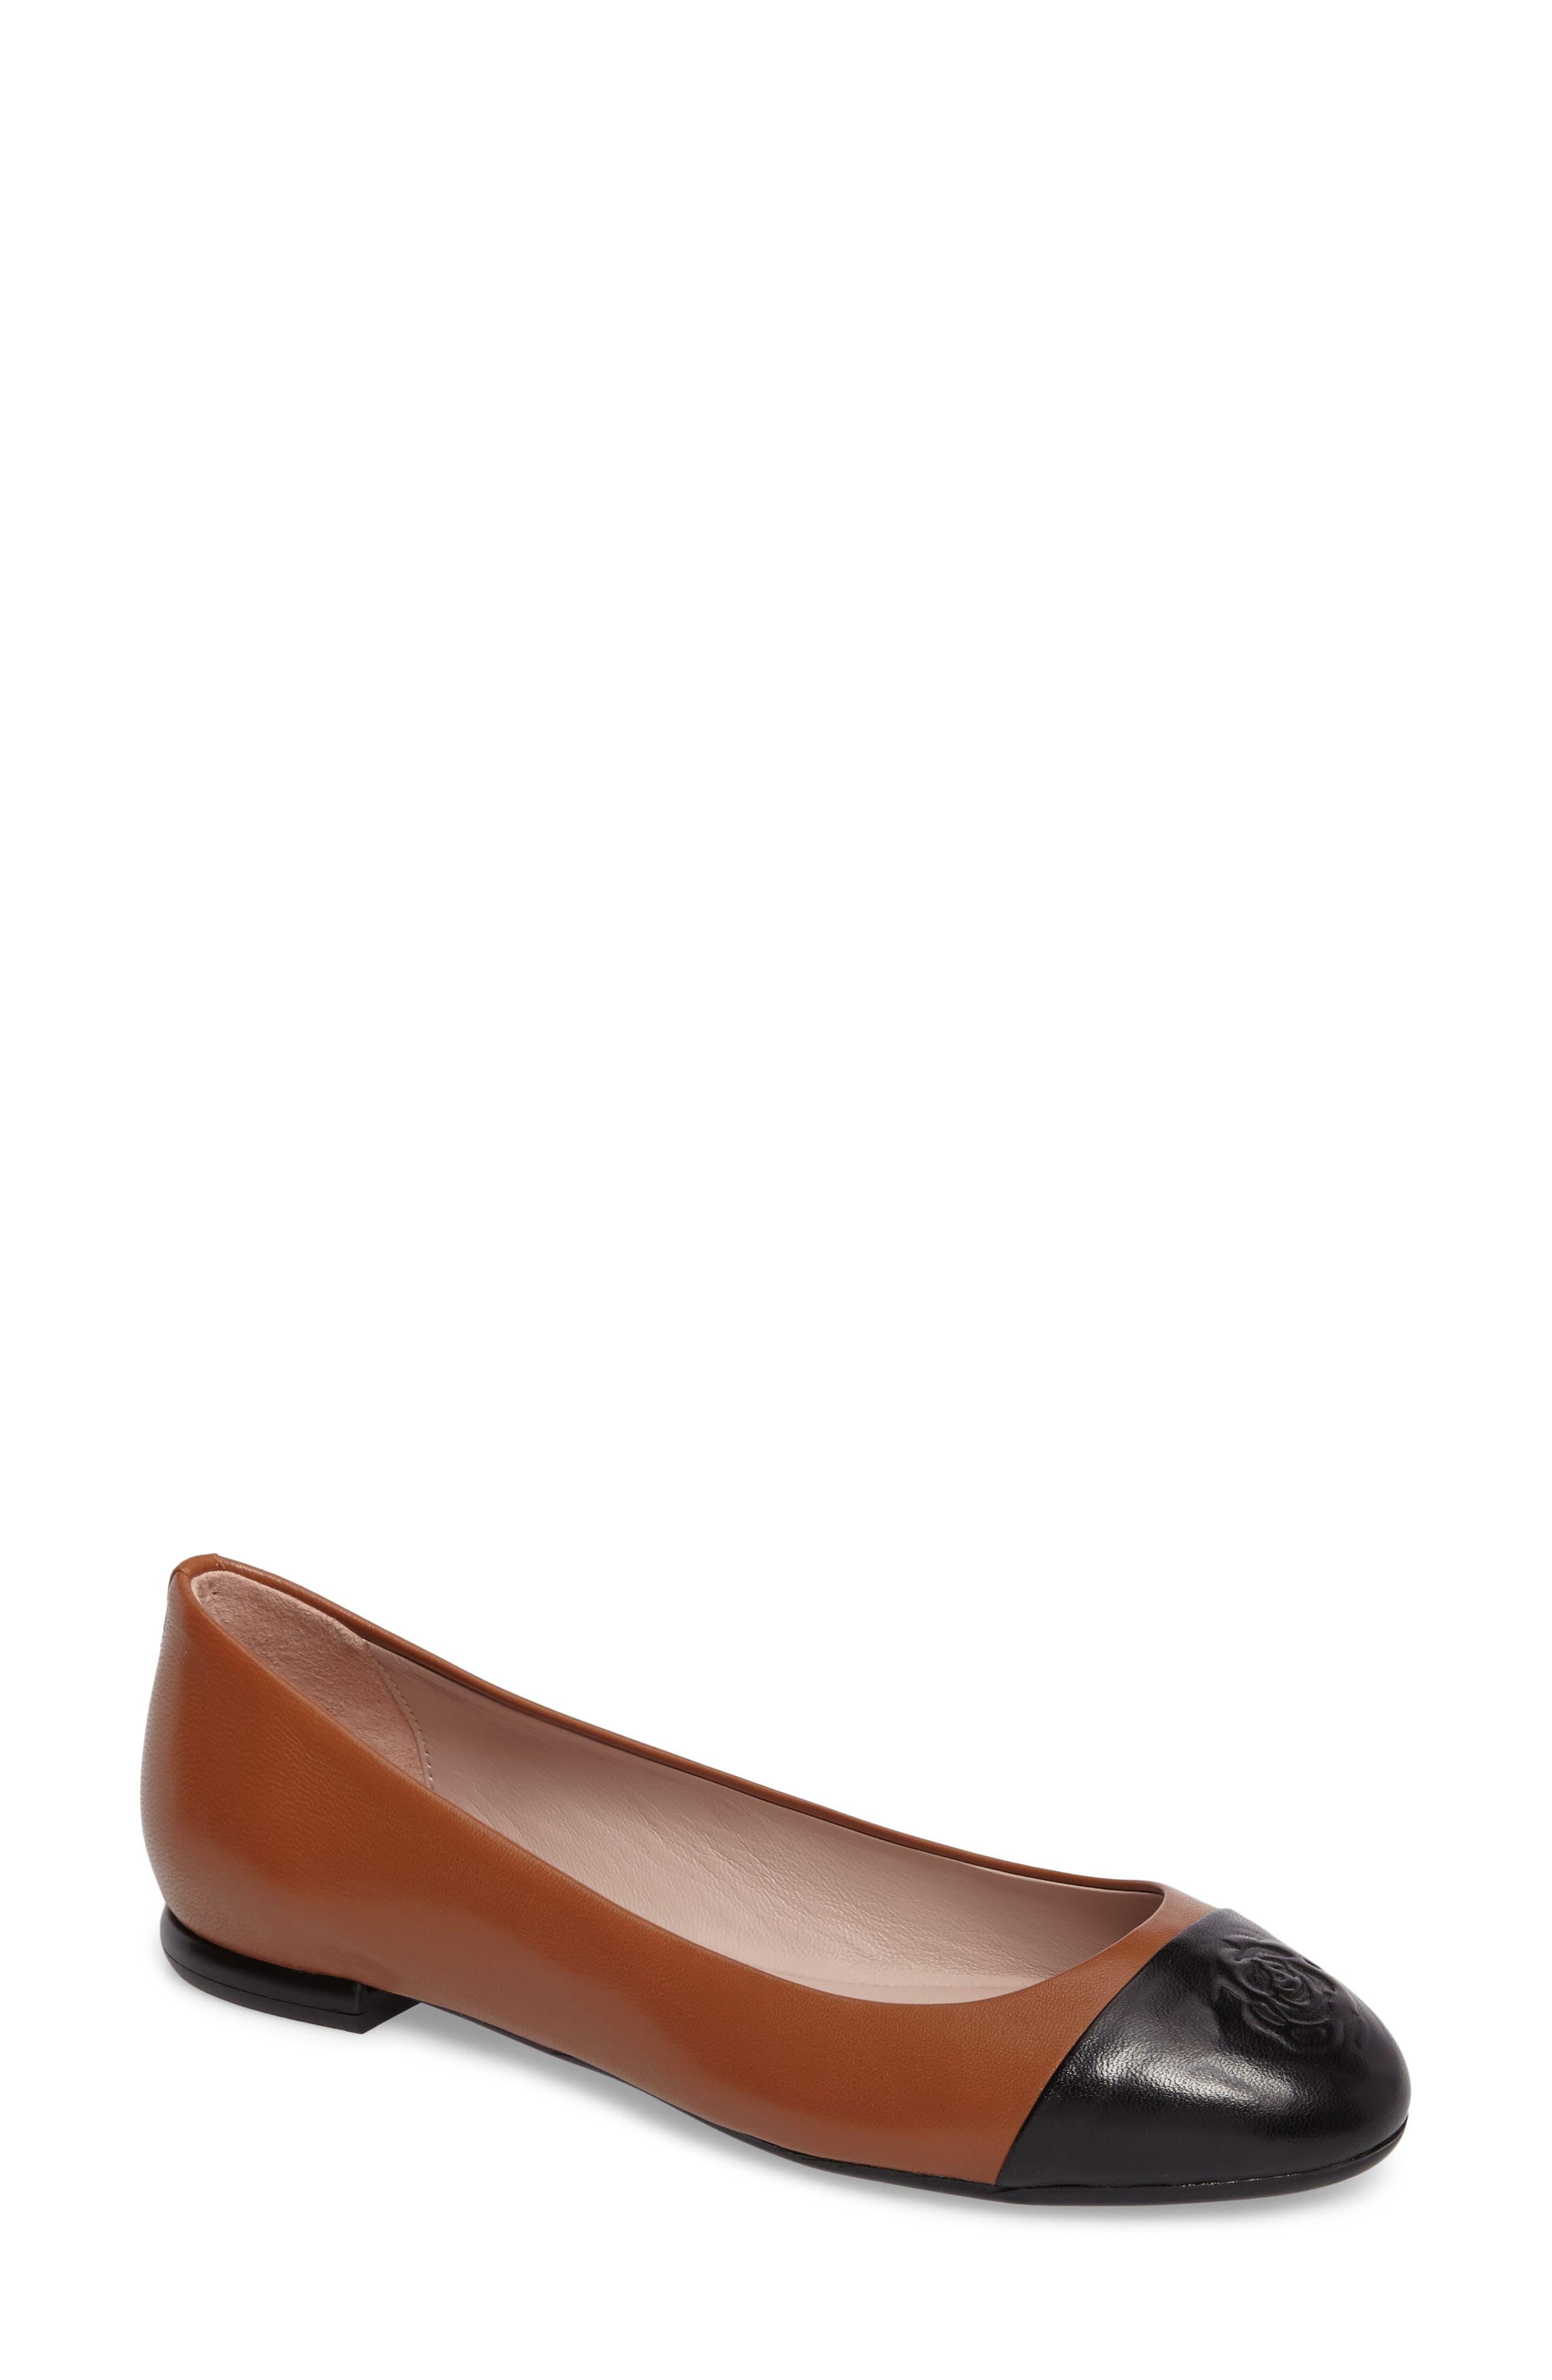 Rosa Ballet Flat,                             Main thumbnail 1, color,                             Tan Leather